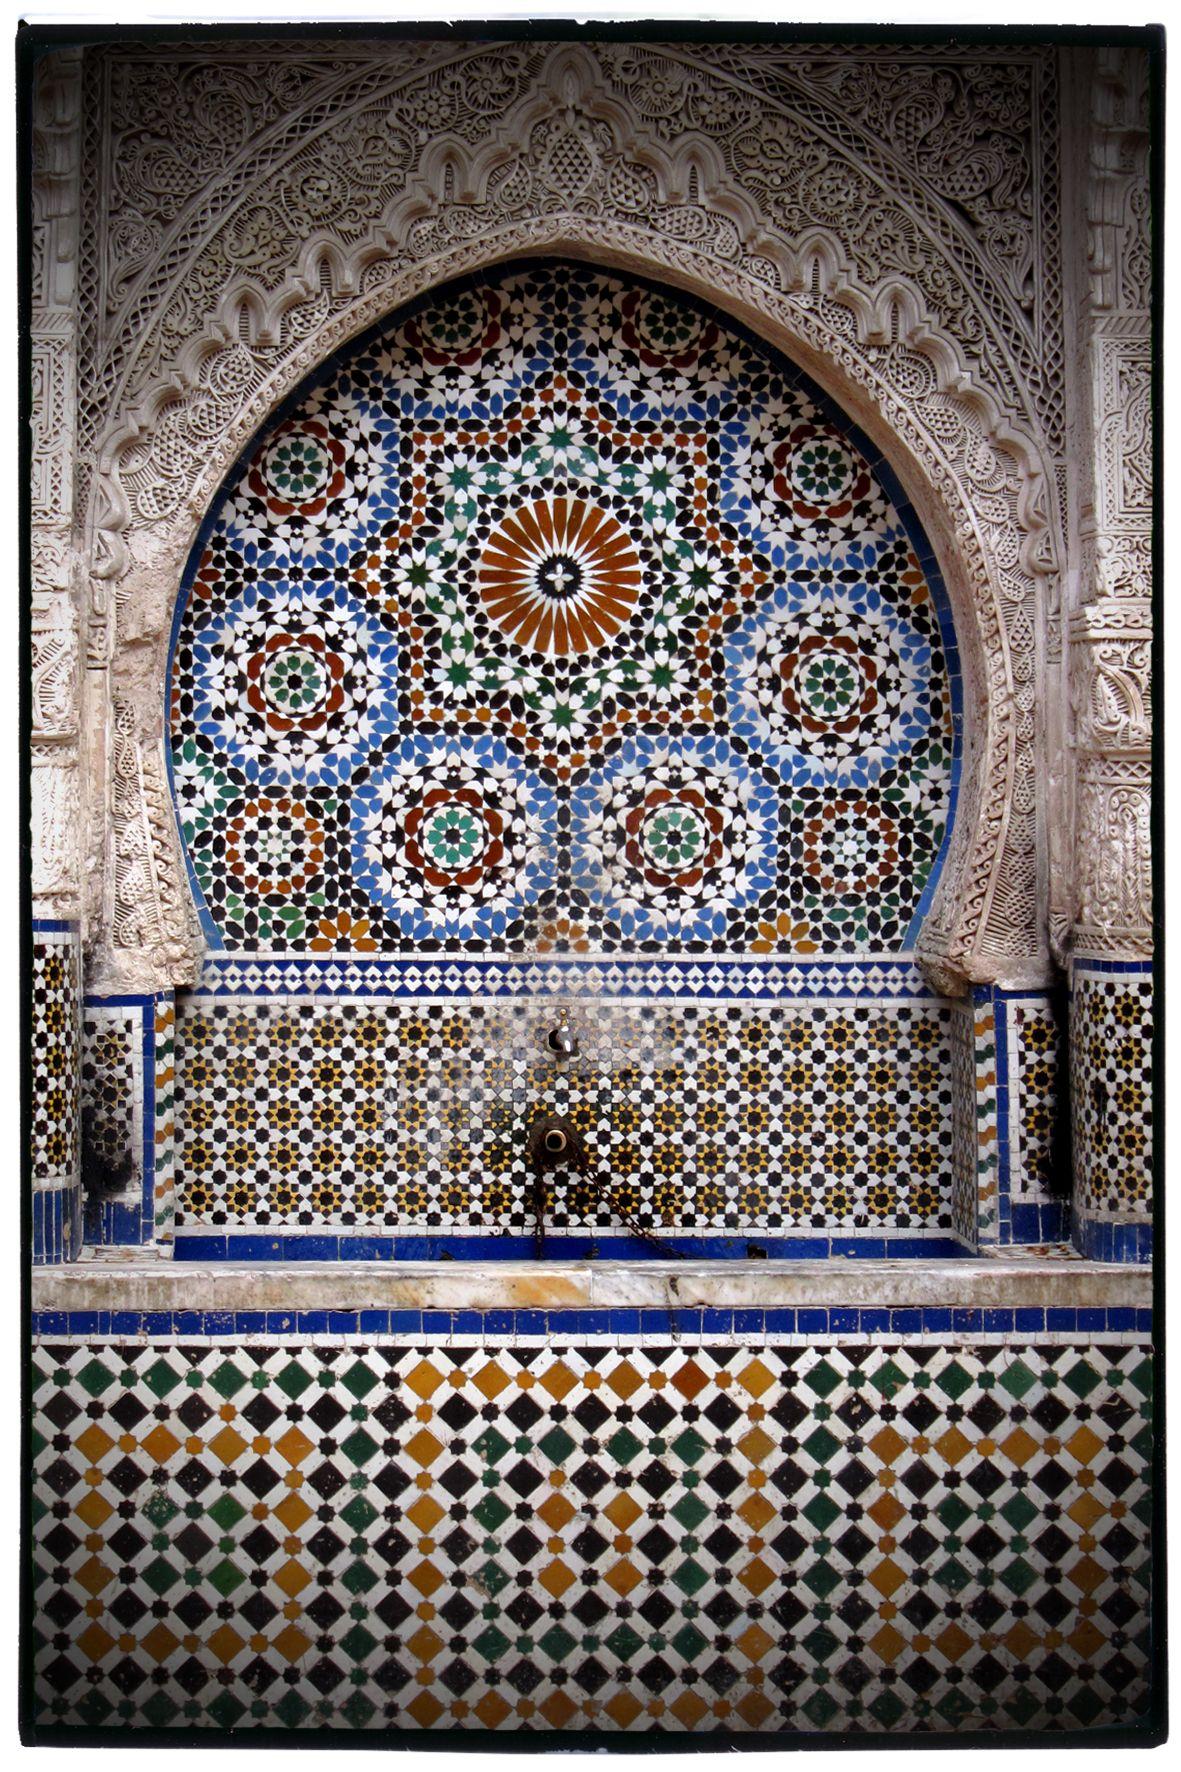 Fes, Morocco Wwwfacebookcommoroccospecialist